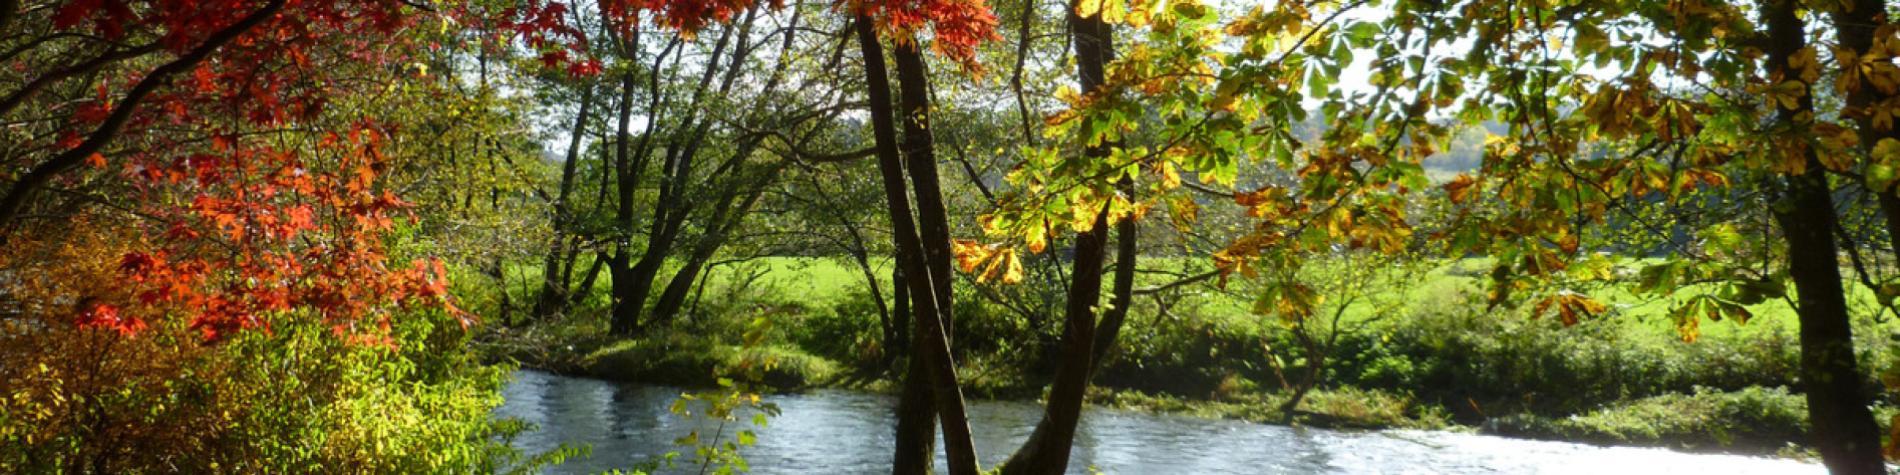 Arboretum Lenoir - Rendeux